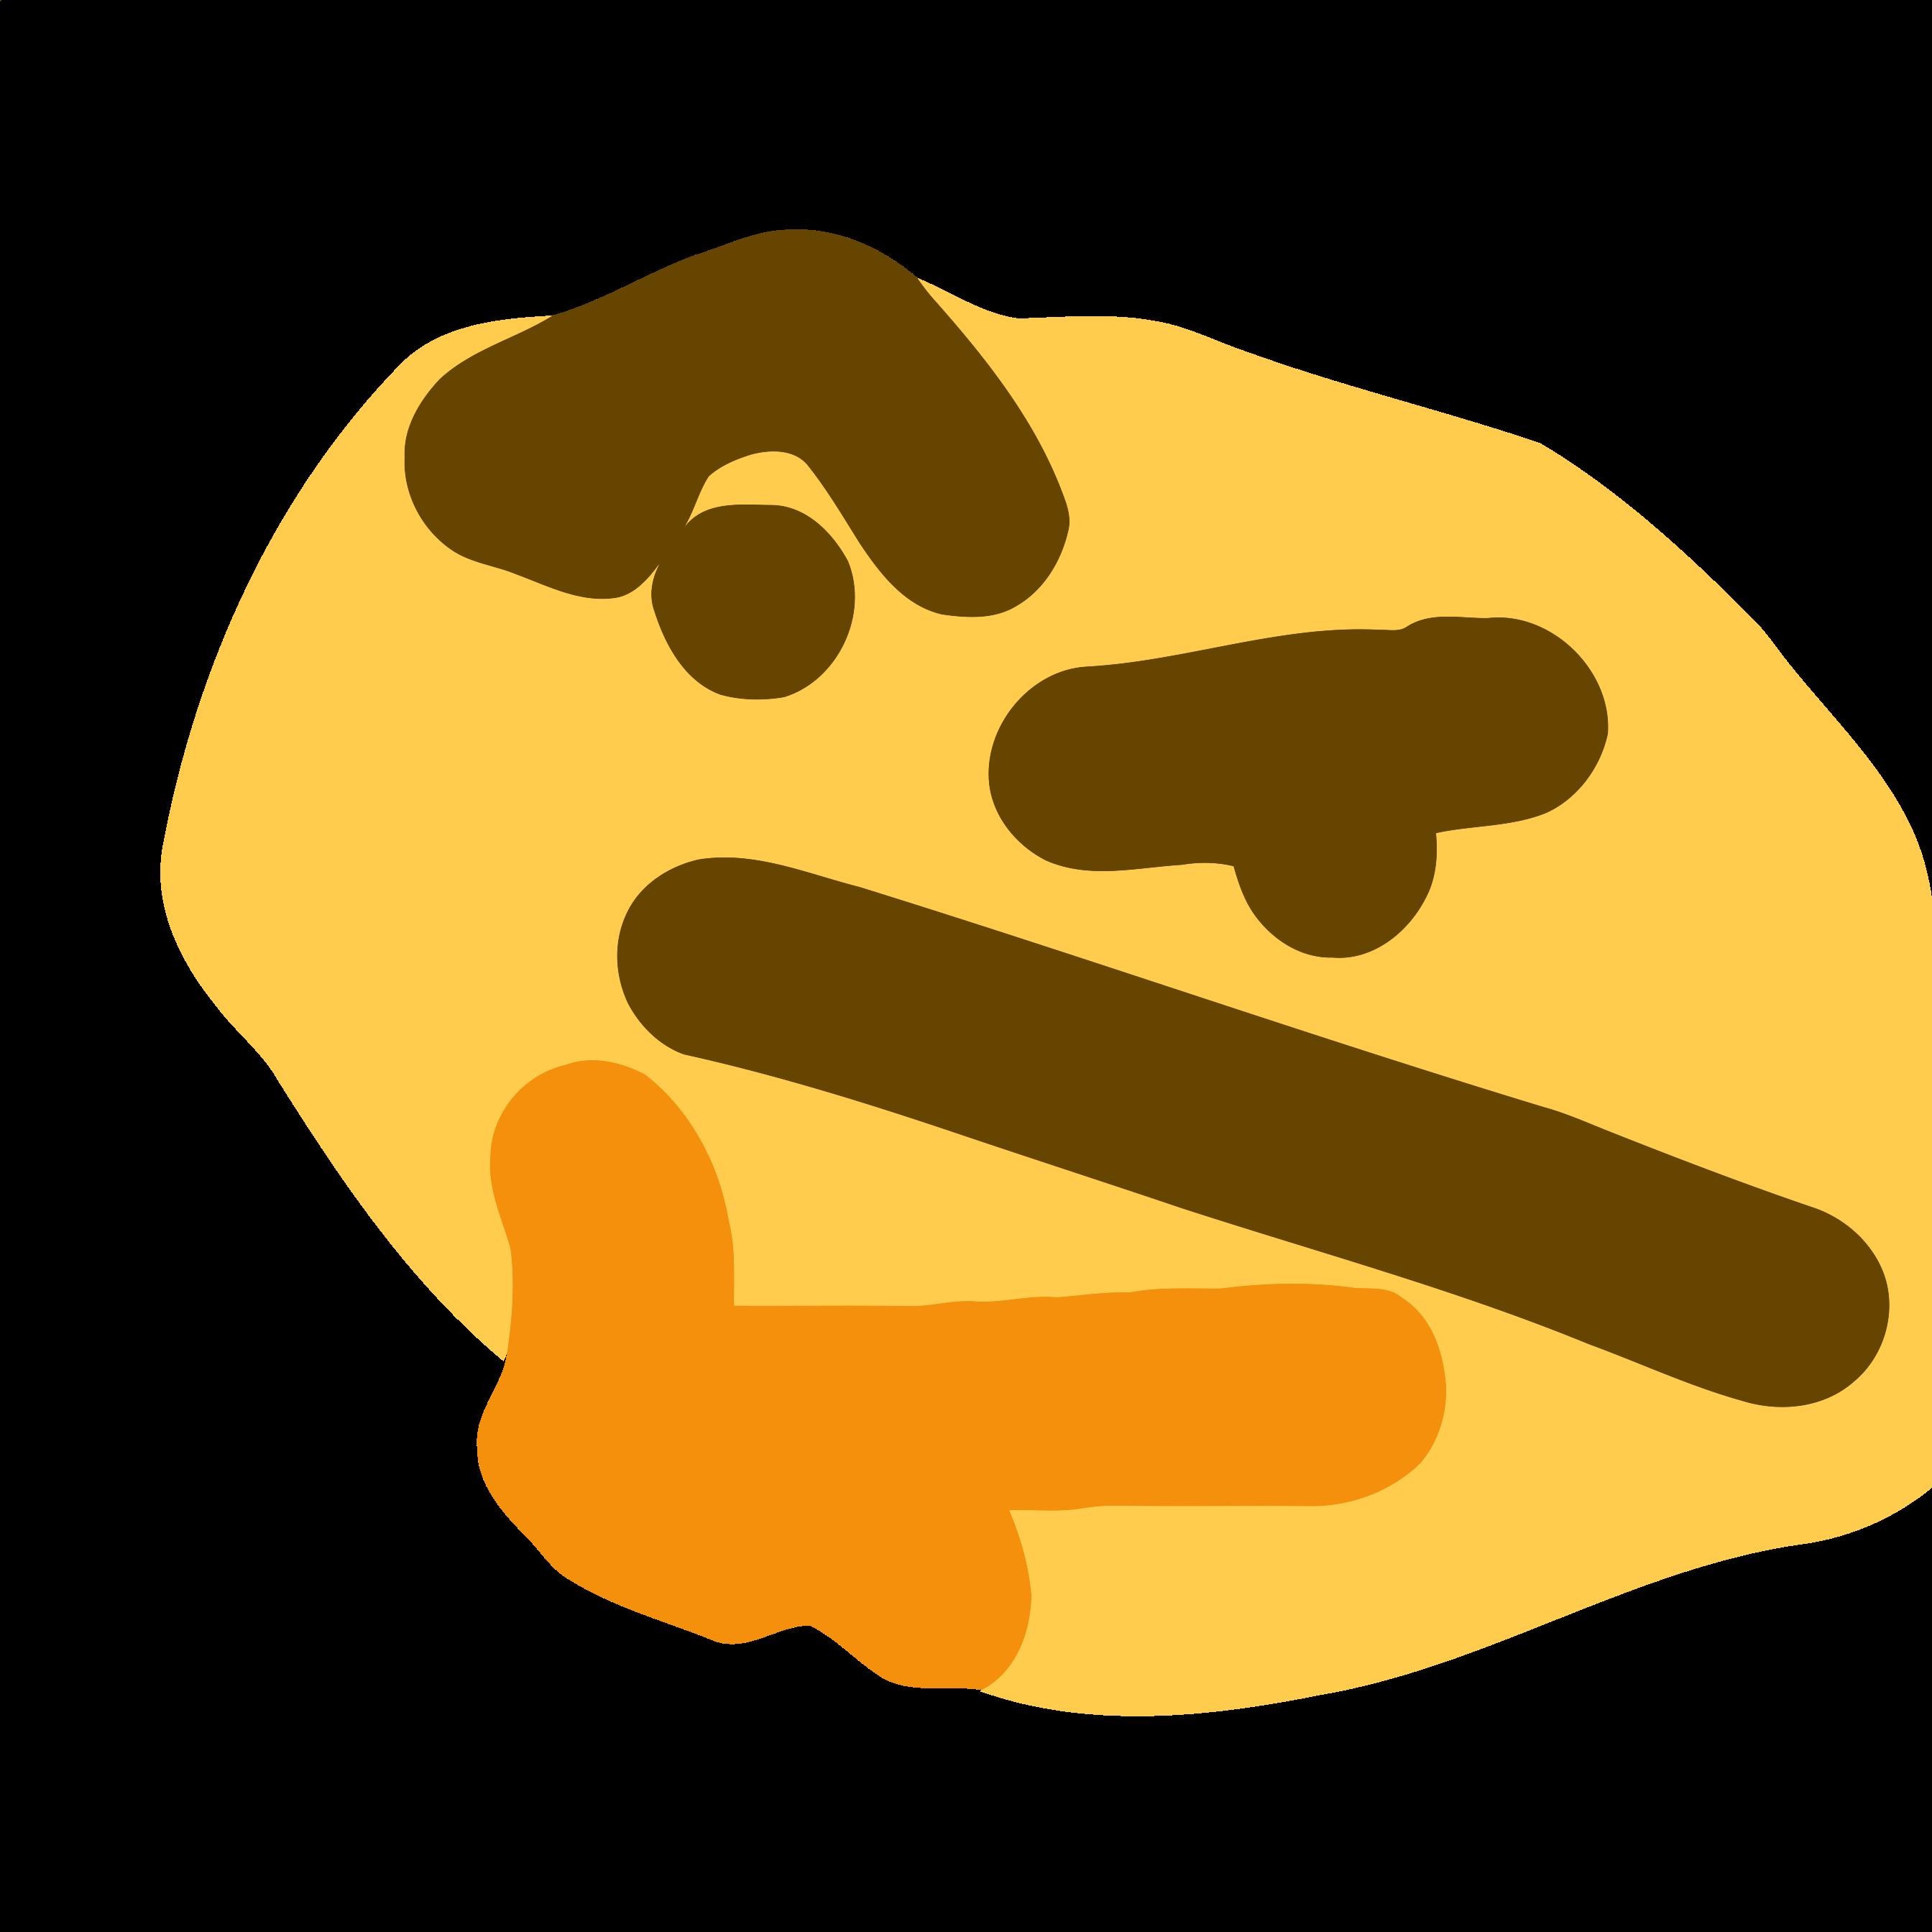 HD mspaint | Thinking Face Emoji 🤔 | Emoji meme, Cute ...